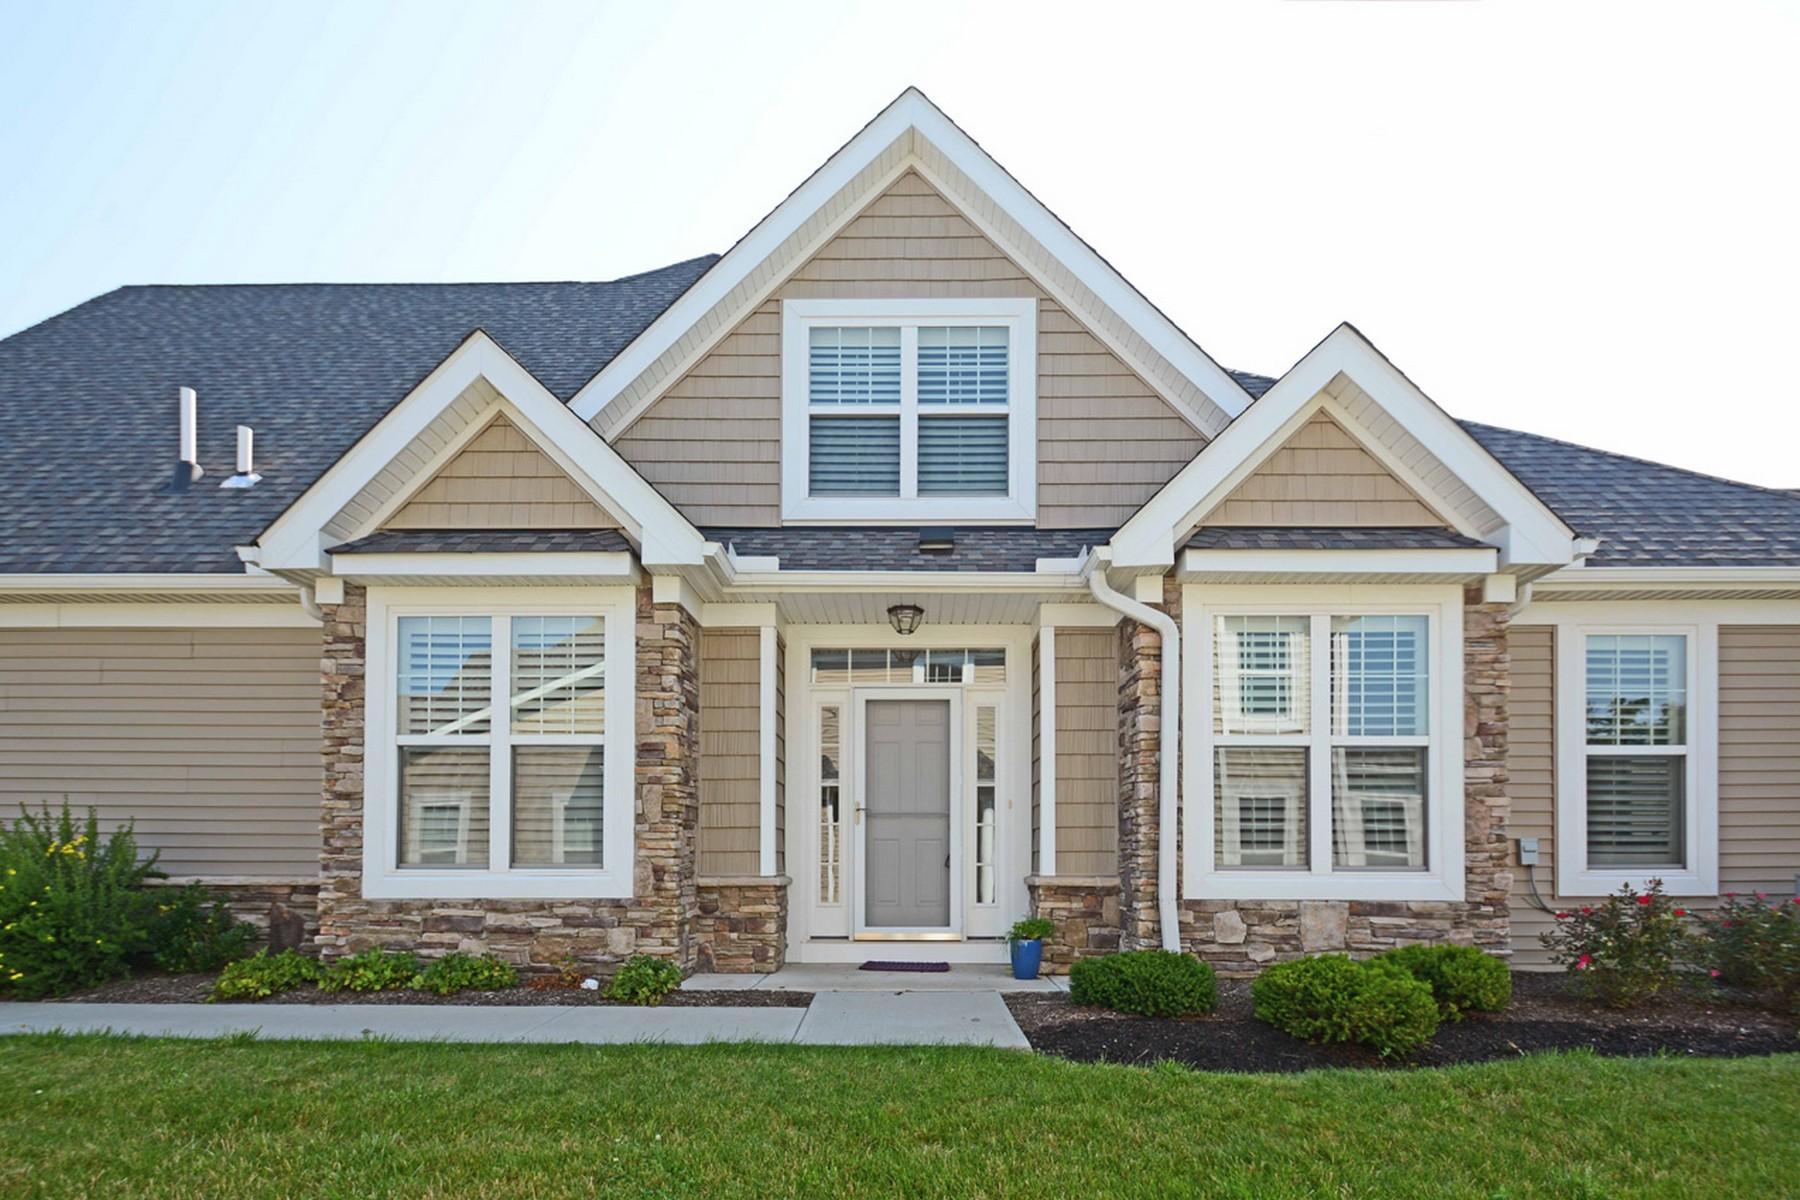 Condominium for Sale at 4748 Tradewinds Drive 4748 Tradewinds Drive Port Clinton, Ohio 43452 United States